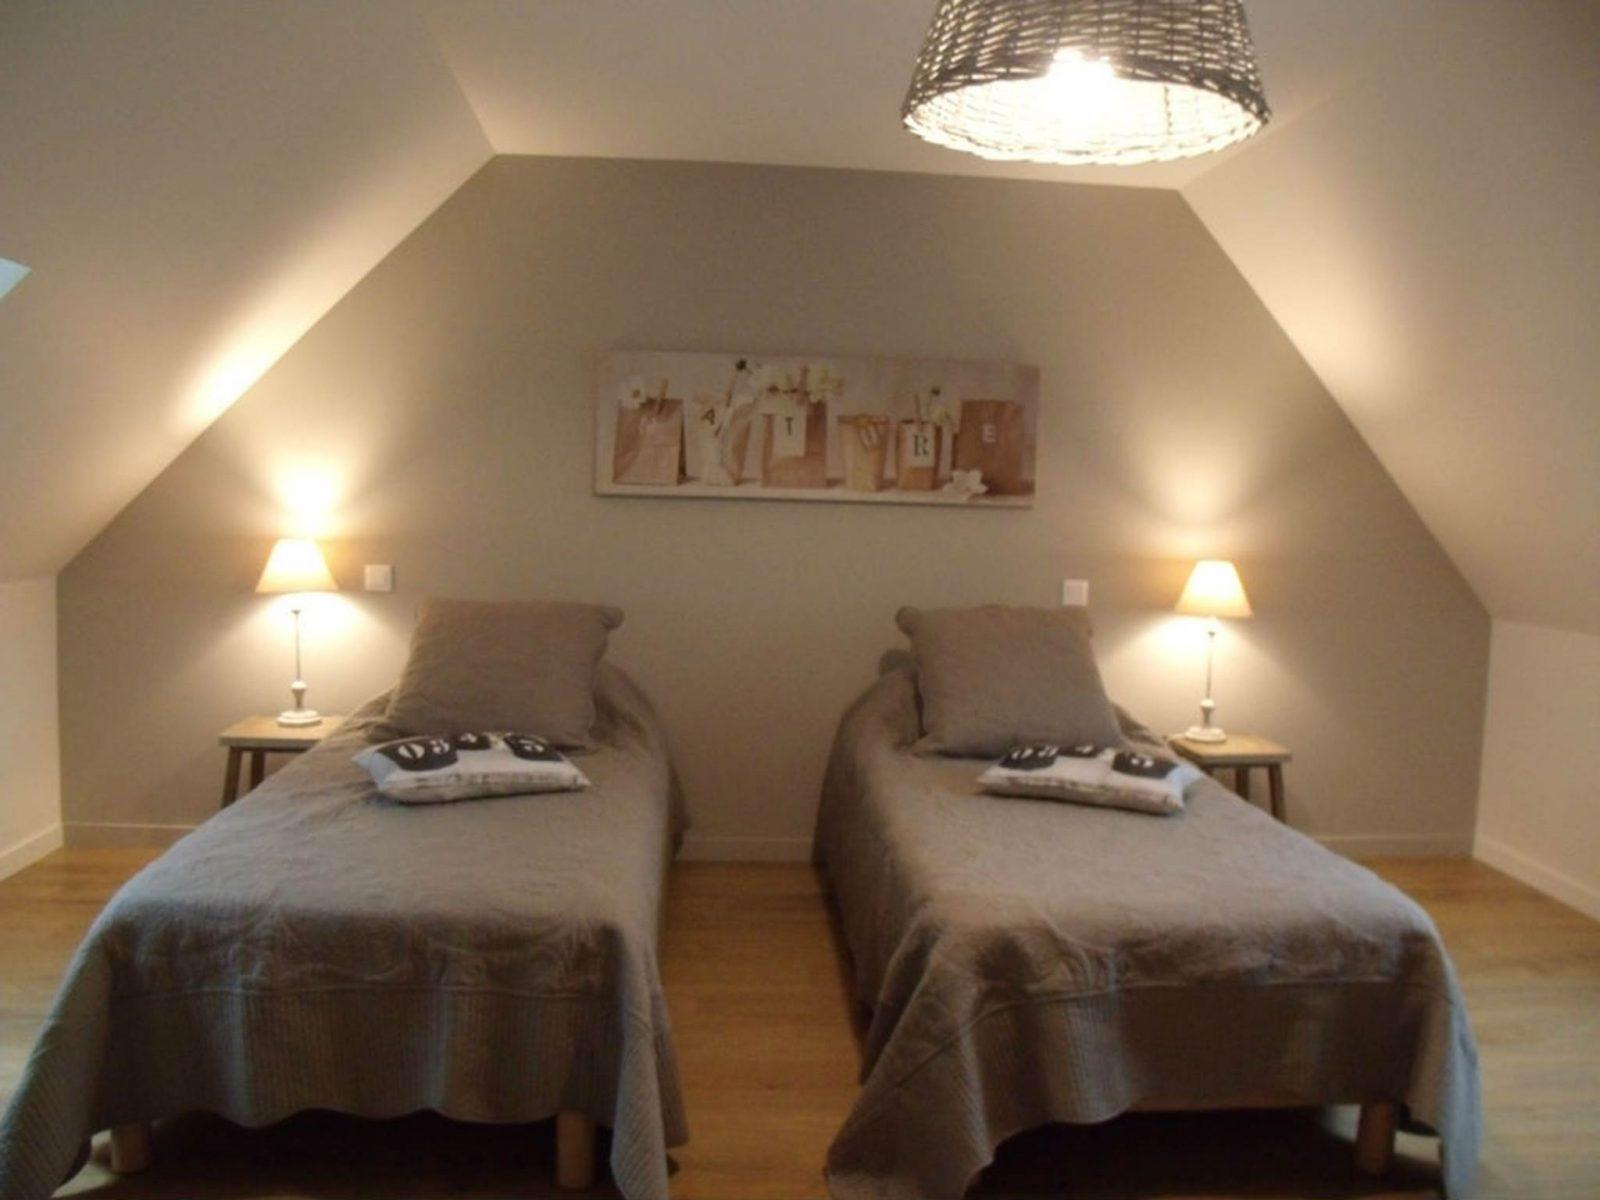 chambre d'hote-Advenard-Nivillac-Tourisme Arc Sud Bretagne